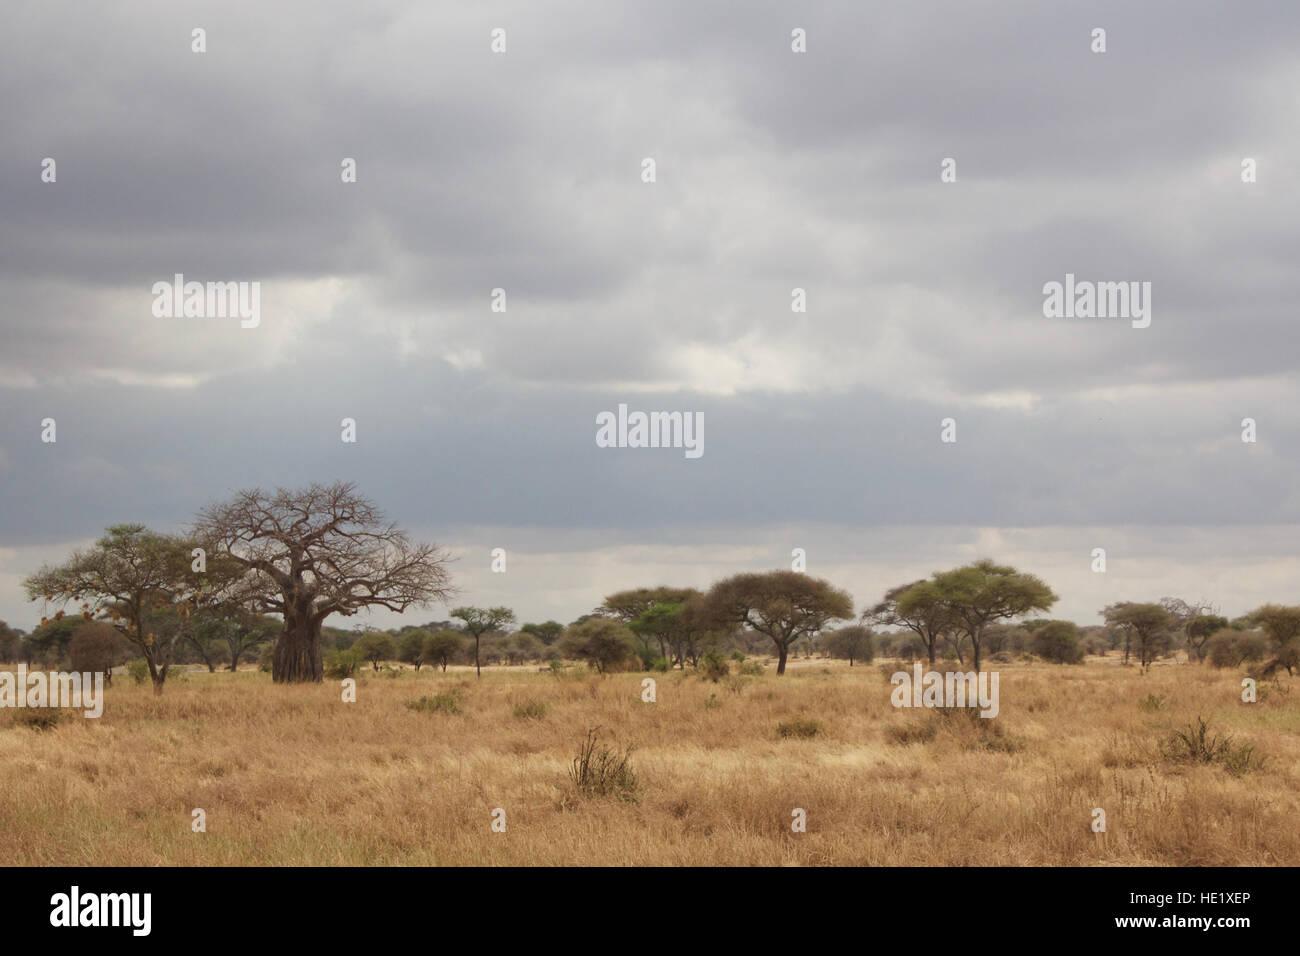 Tarangire National Park - Stock Image